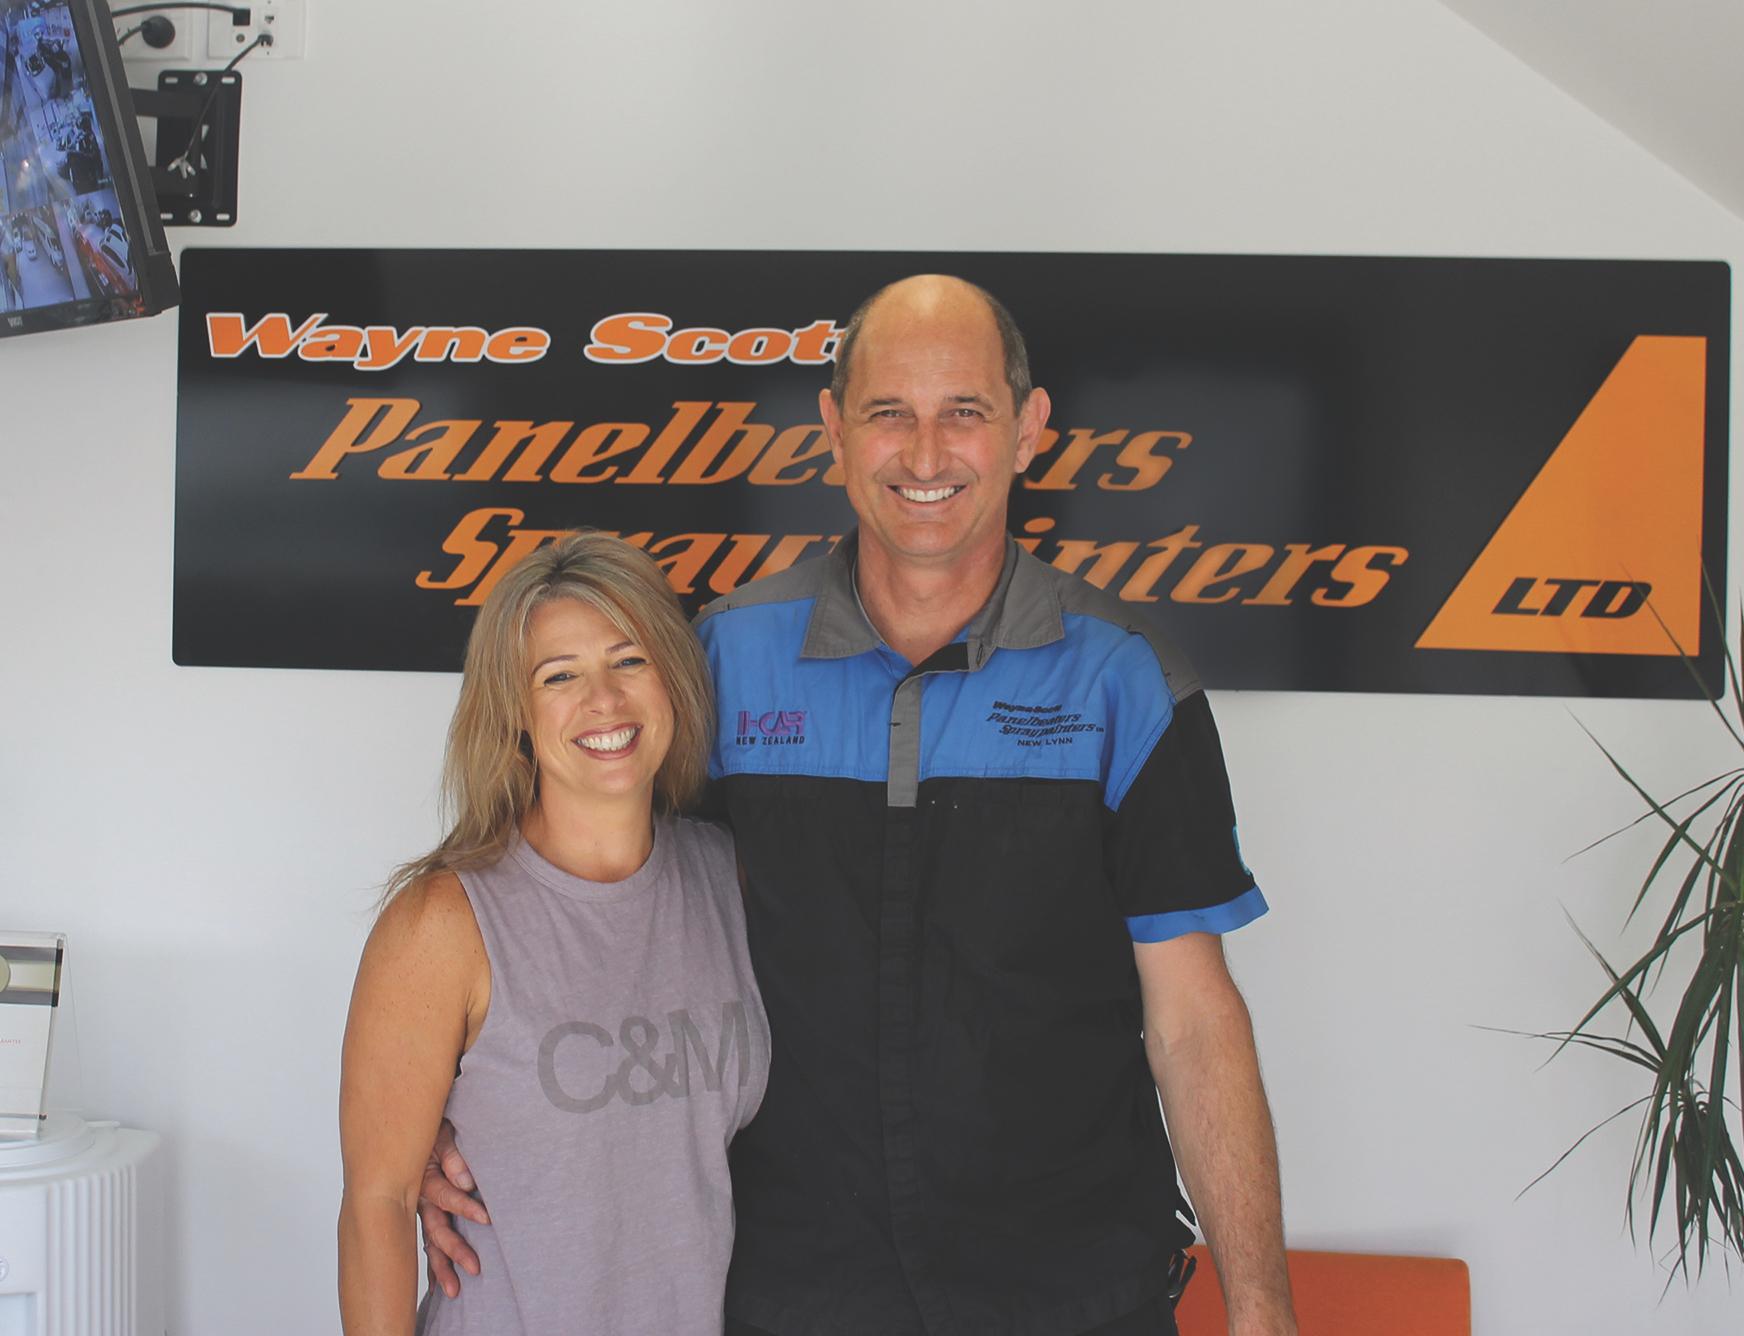 Owners and operators - Wayne and Paula Scott